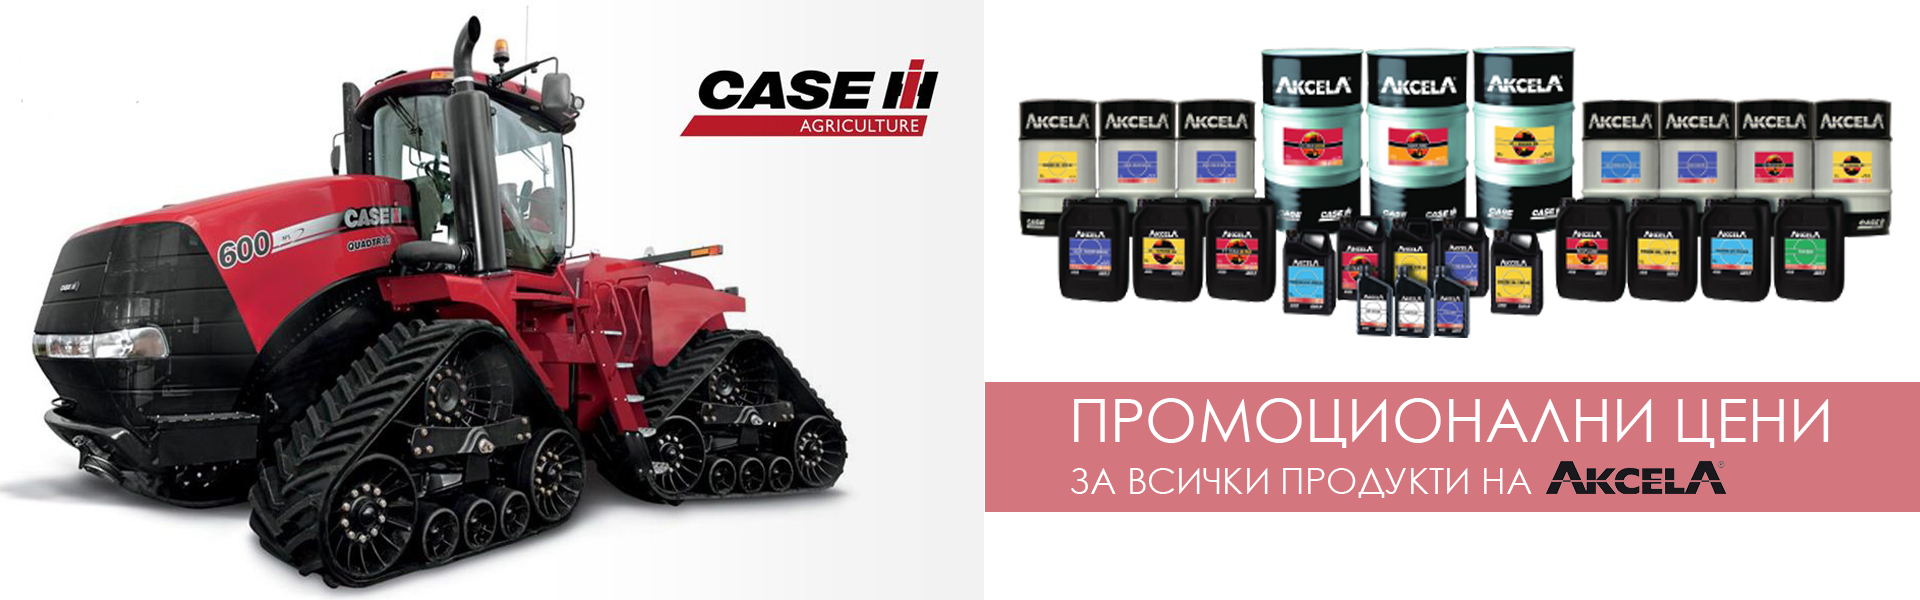 Промоционални изгодни цени за моторни, хидравлични и трансмисионни масла Akcela за Case